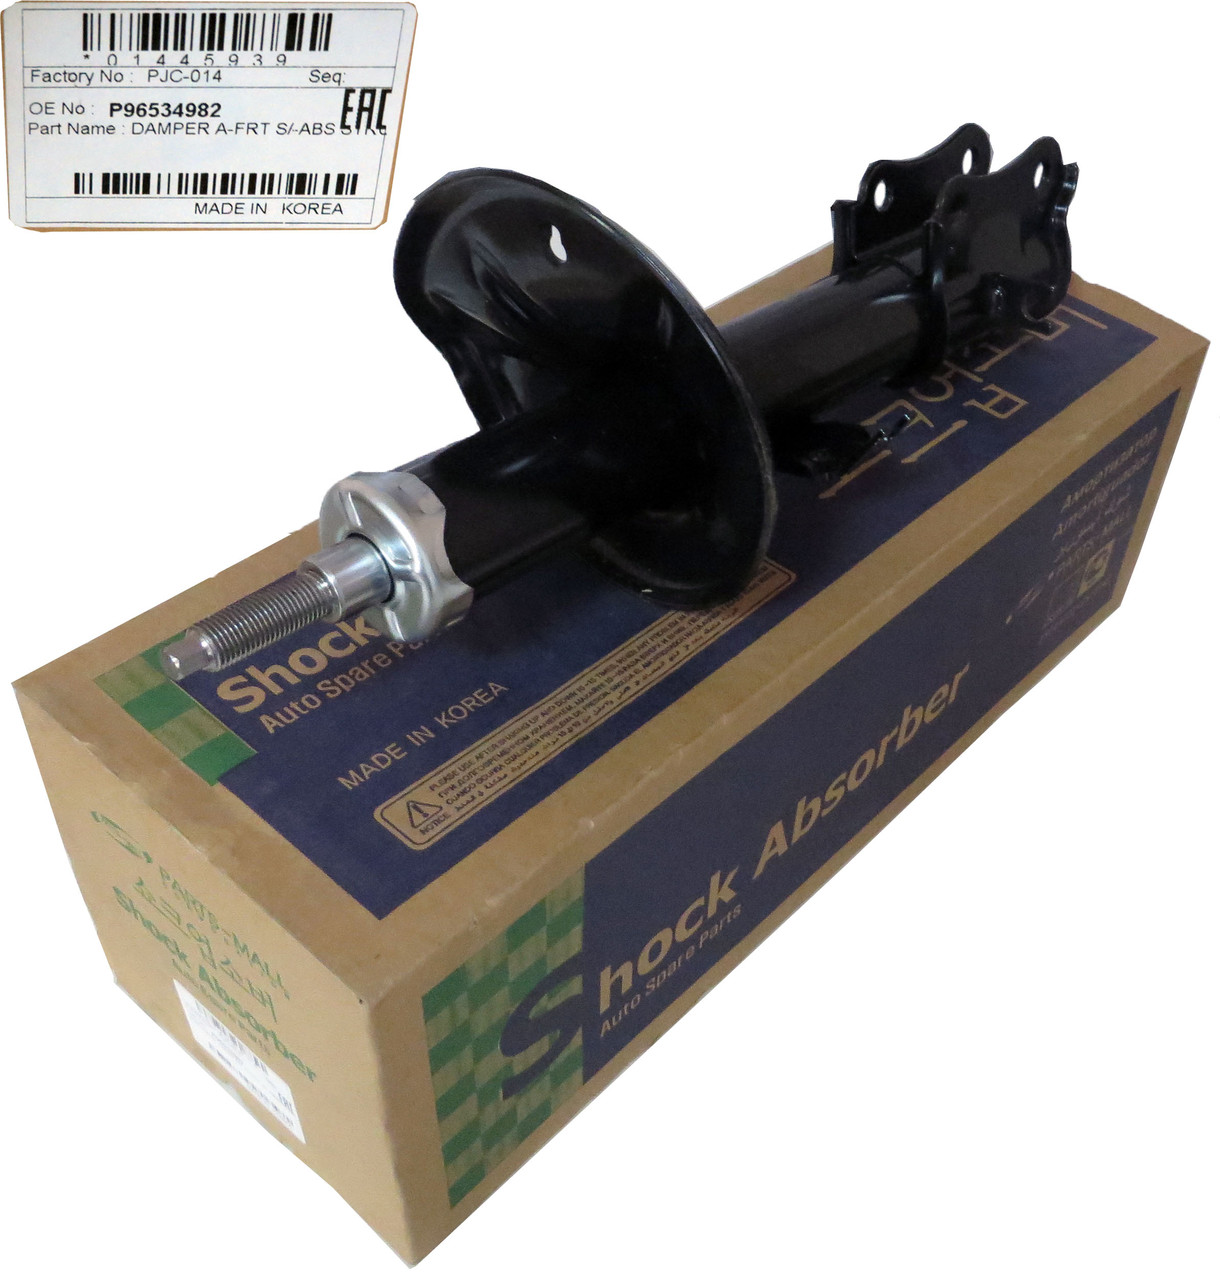 Амортизатор передний масло Авео PARTS MALL правый, PJC-014, P96534982